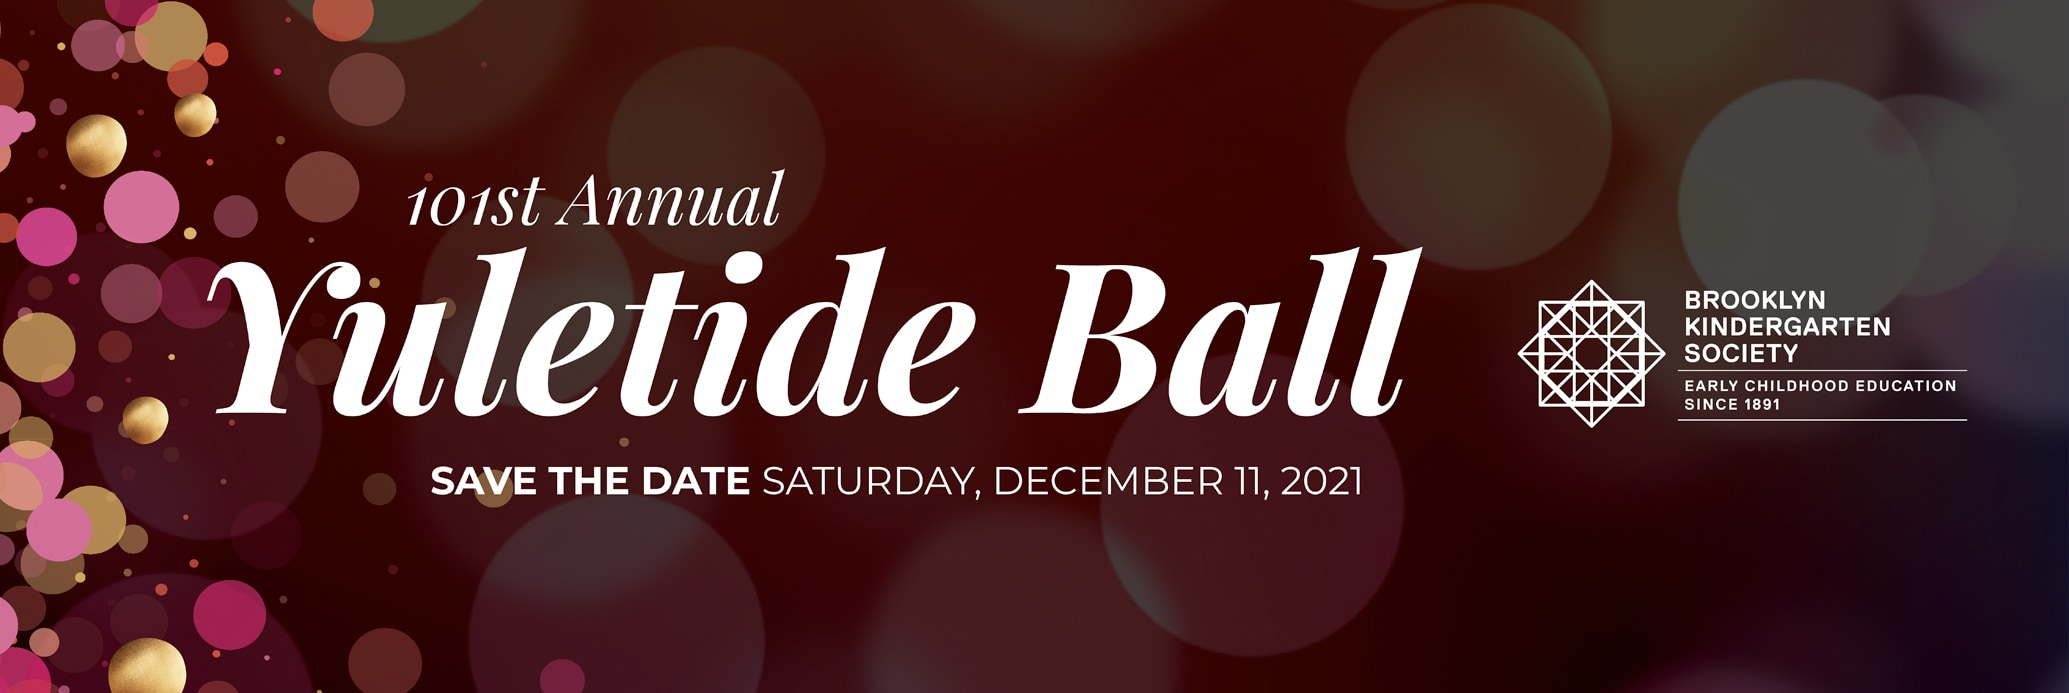 Yuletide Ball 2021